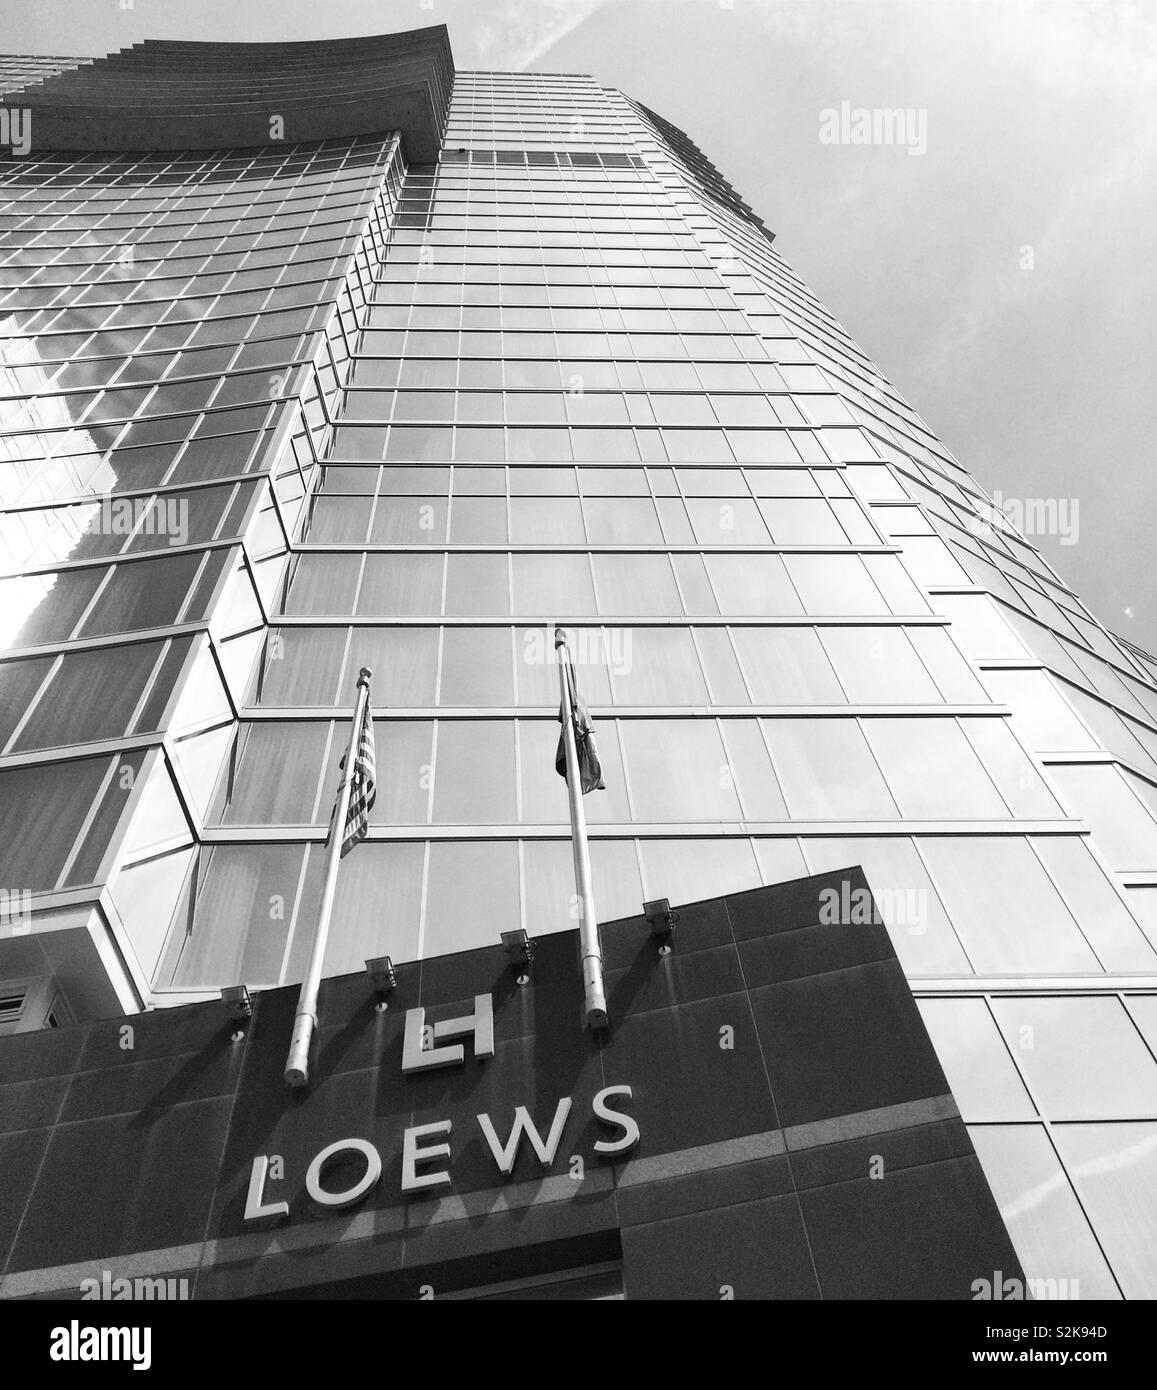 A black and white image of the Loews Atlanta Hotel, Atlanta, Georgia, United States - Stock Image